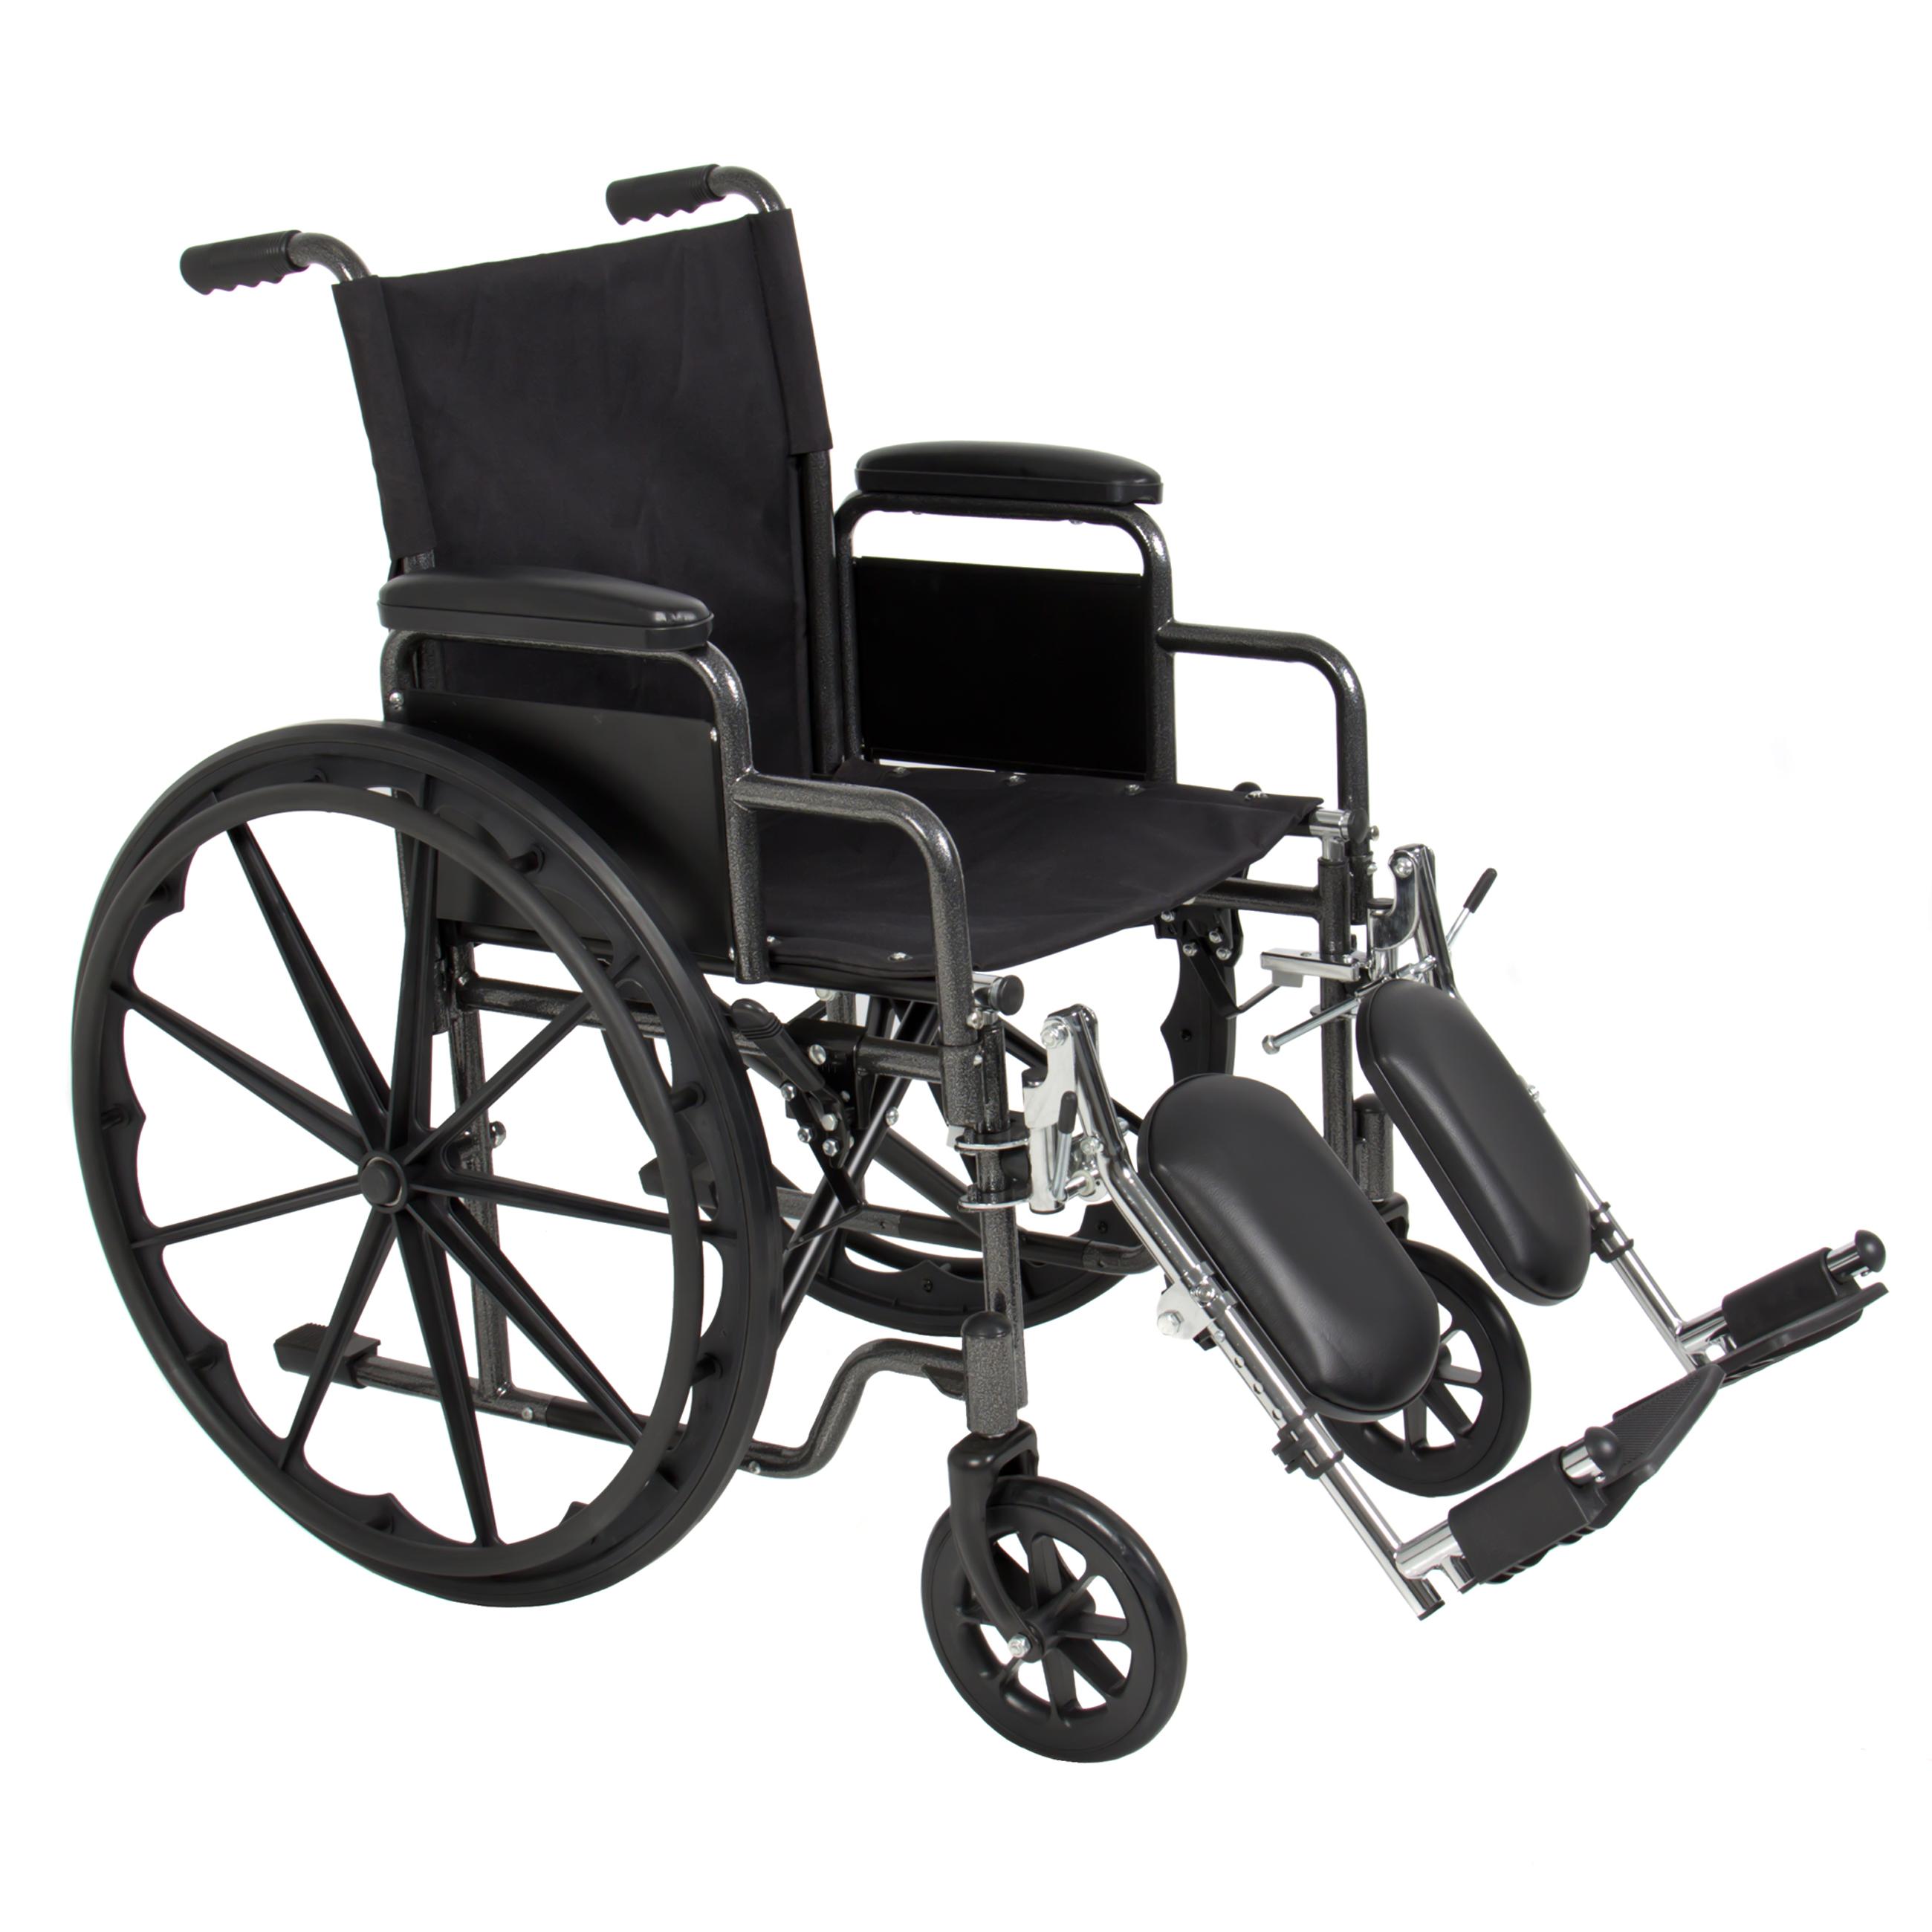 Folding Wheelchair Full Armrests & Elevating Legrests Light Weight